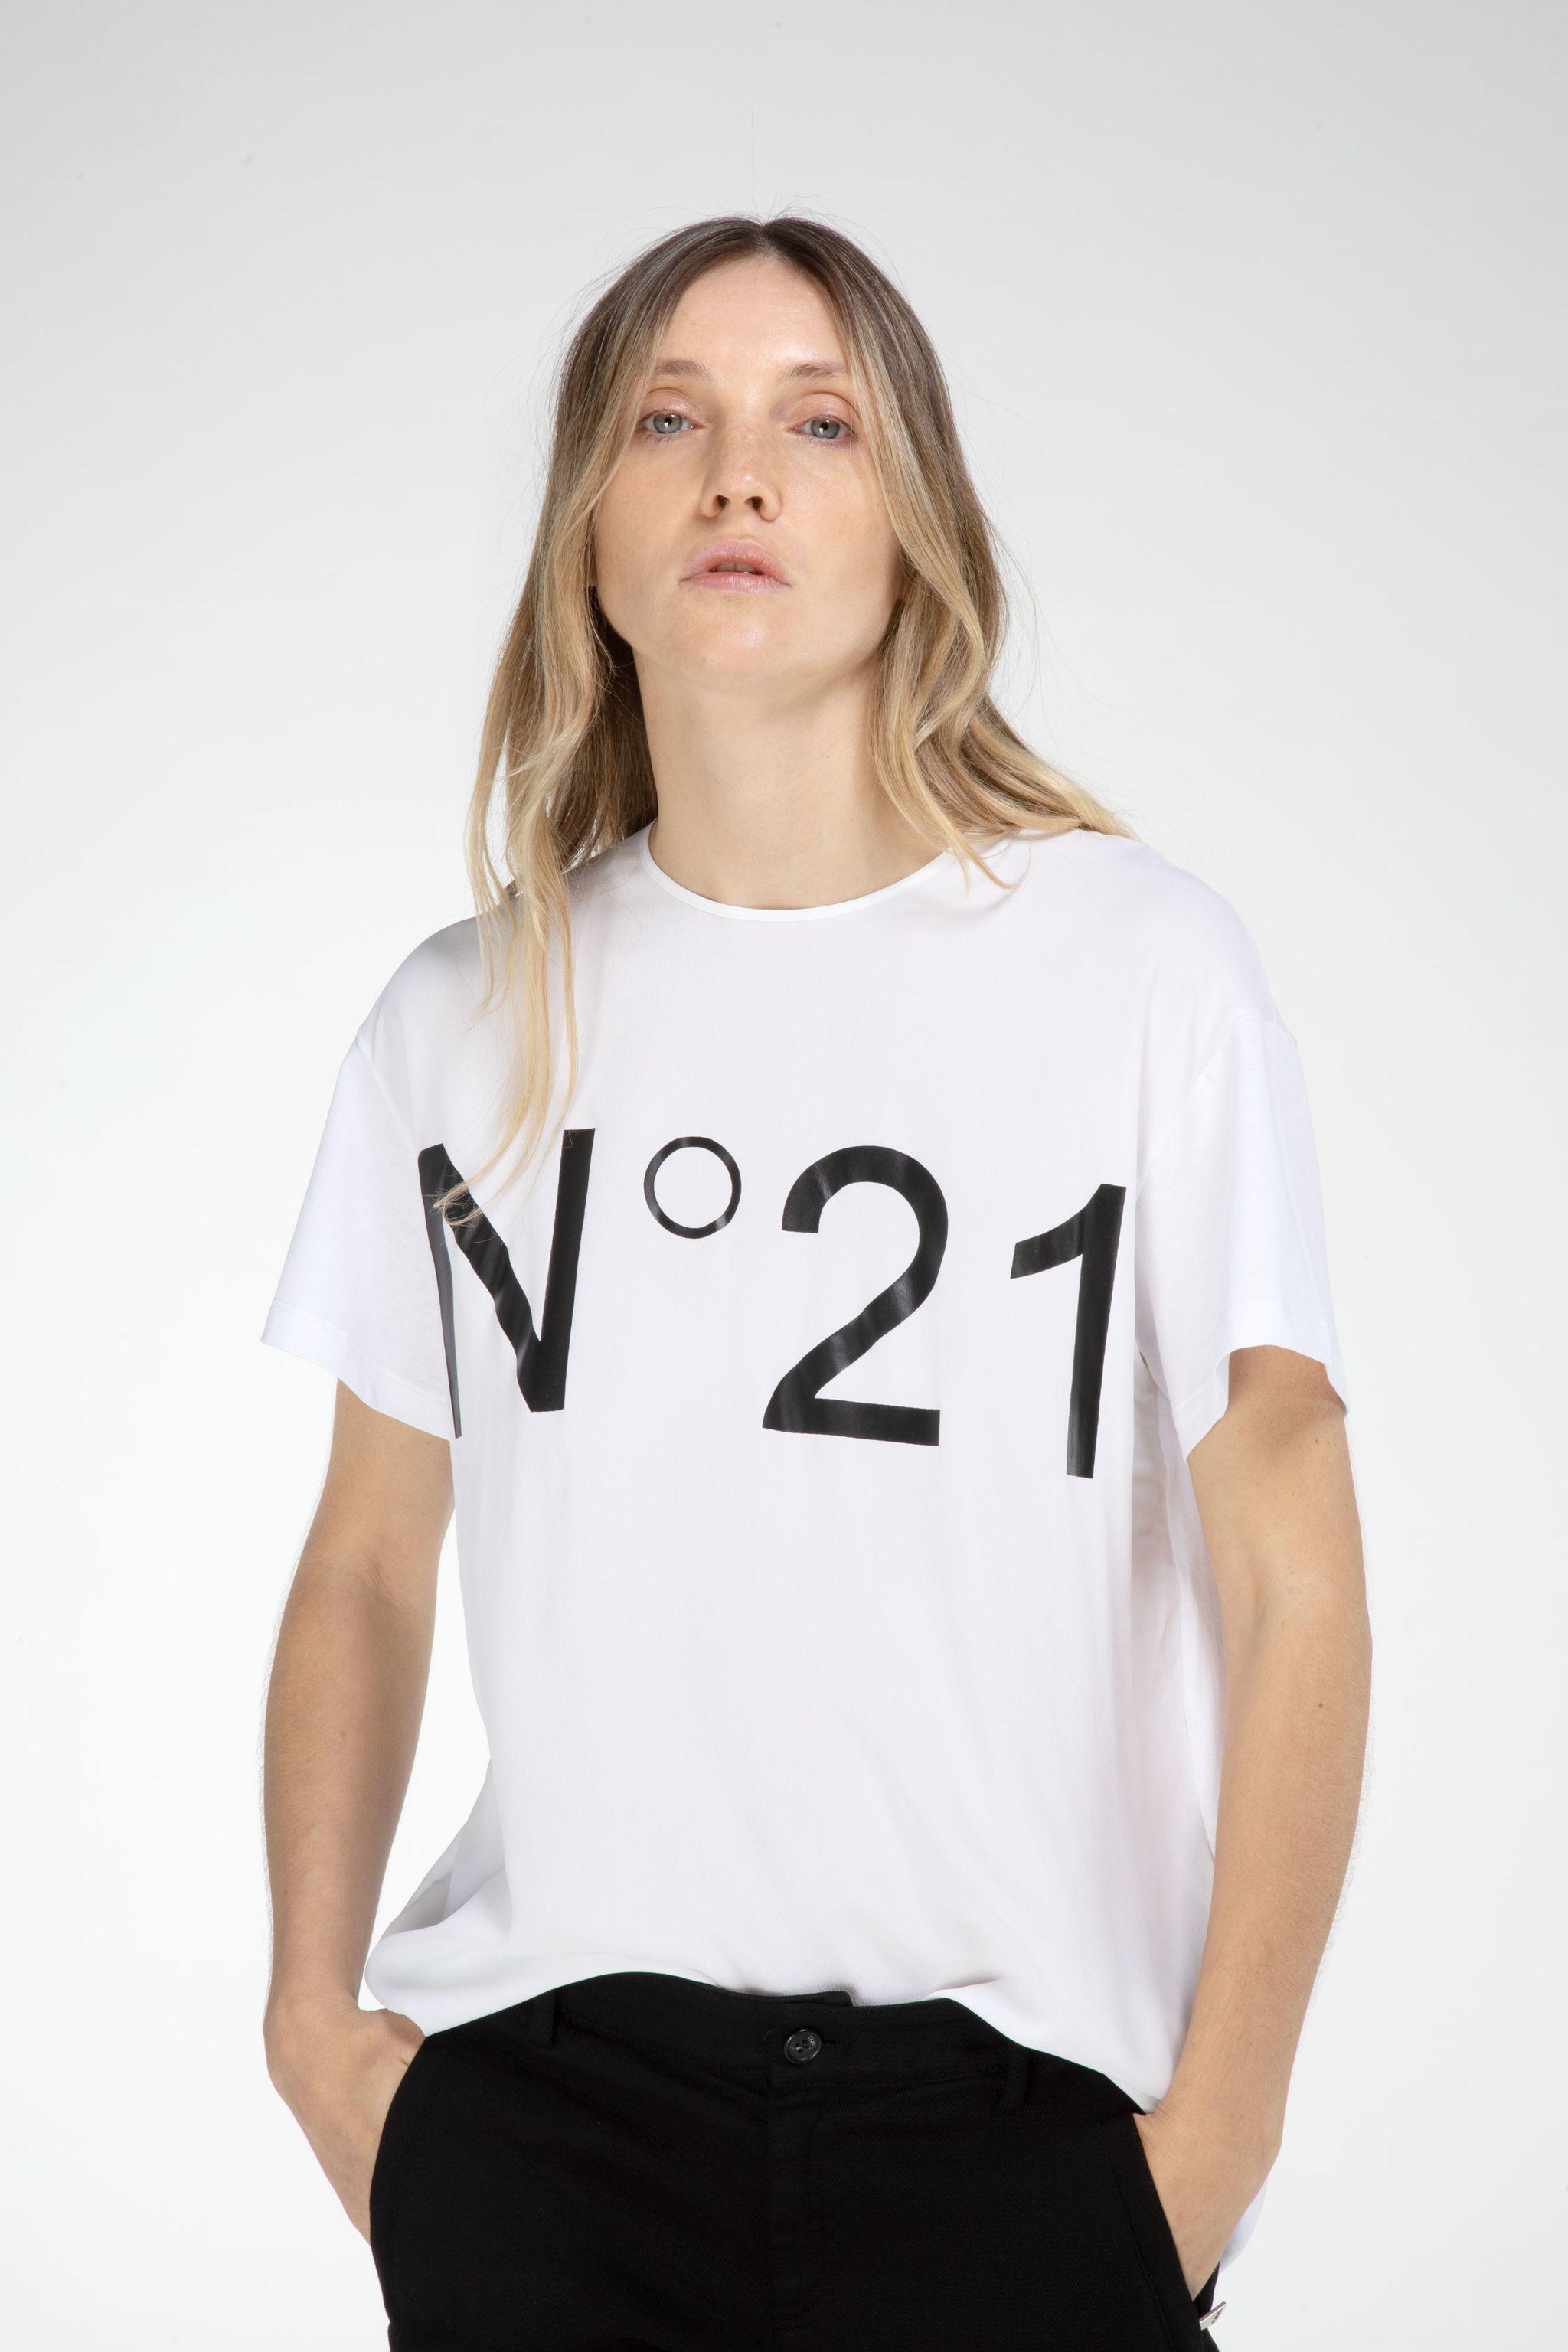 no21-logo-print-t-shirt_11830548_15933265_2048